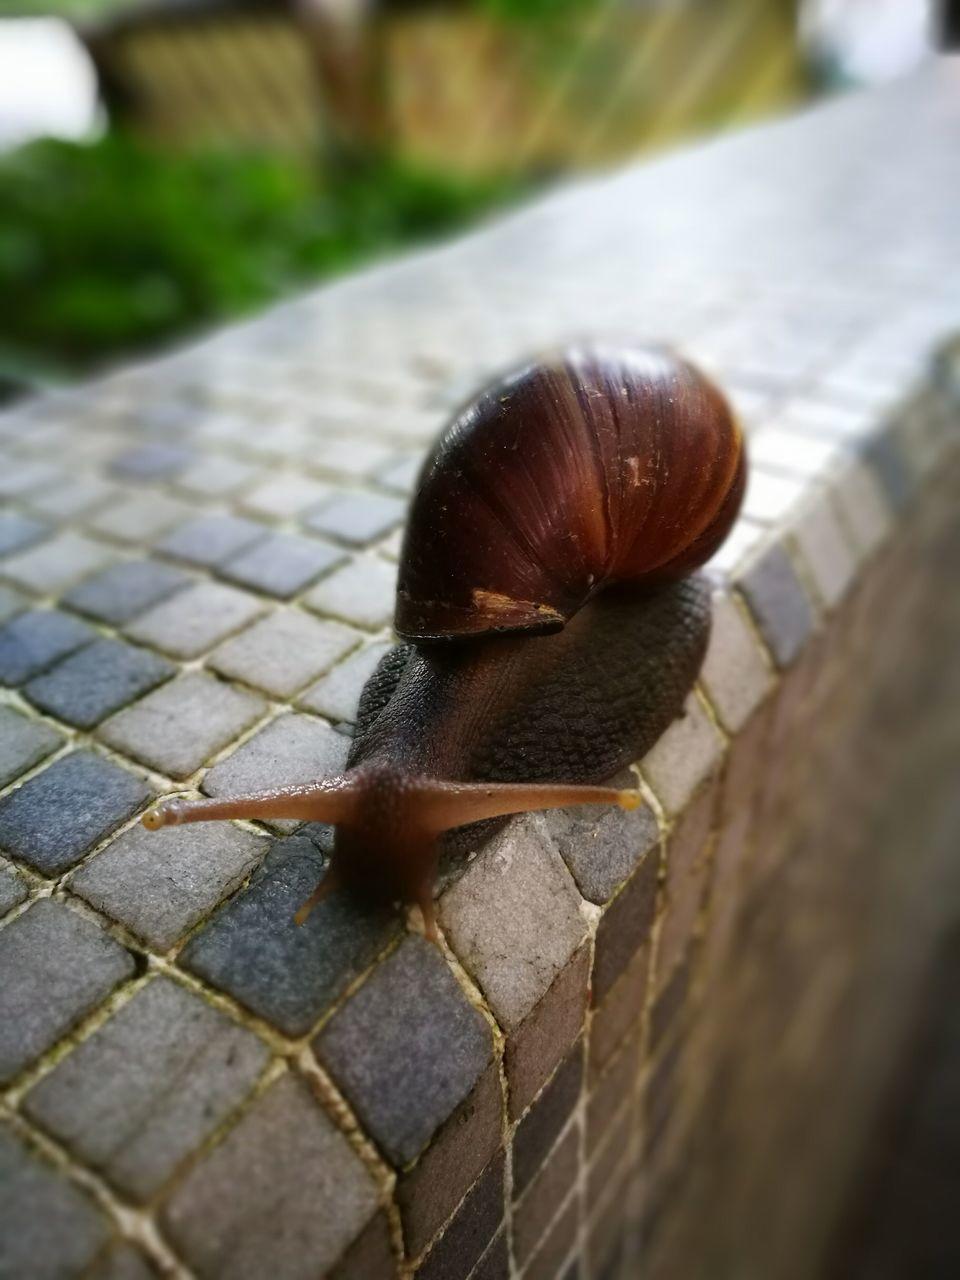 snail, one animal, animal themes, gastropod, wildlife, animals in the wild, close-up, day, no people, outdoors, slug, nature, animal wildlife, fragility